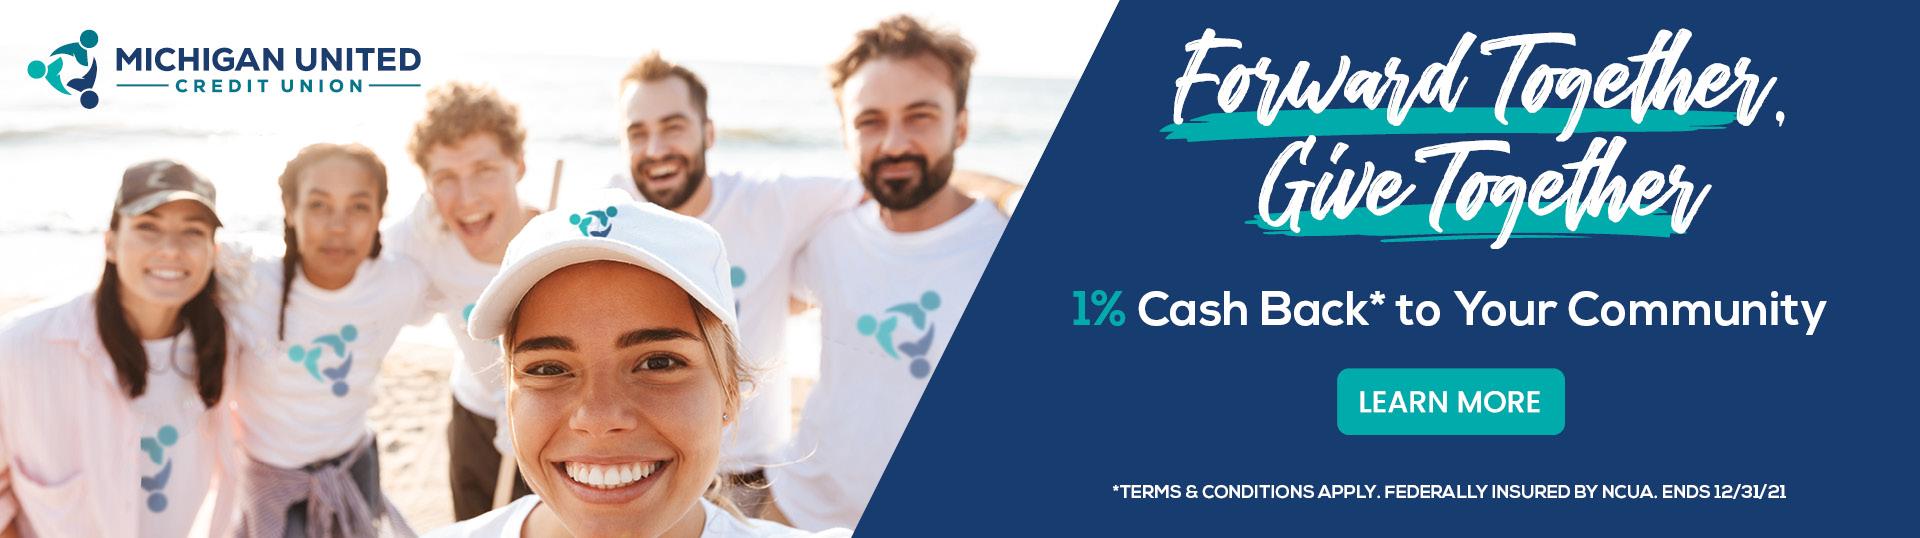 1% cash back community promo